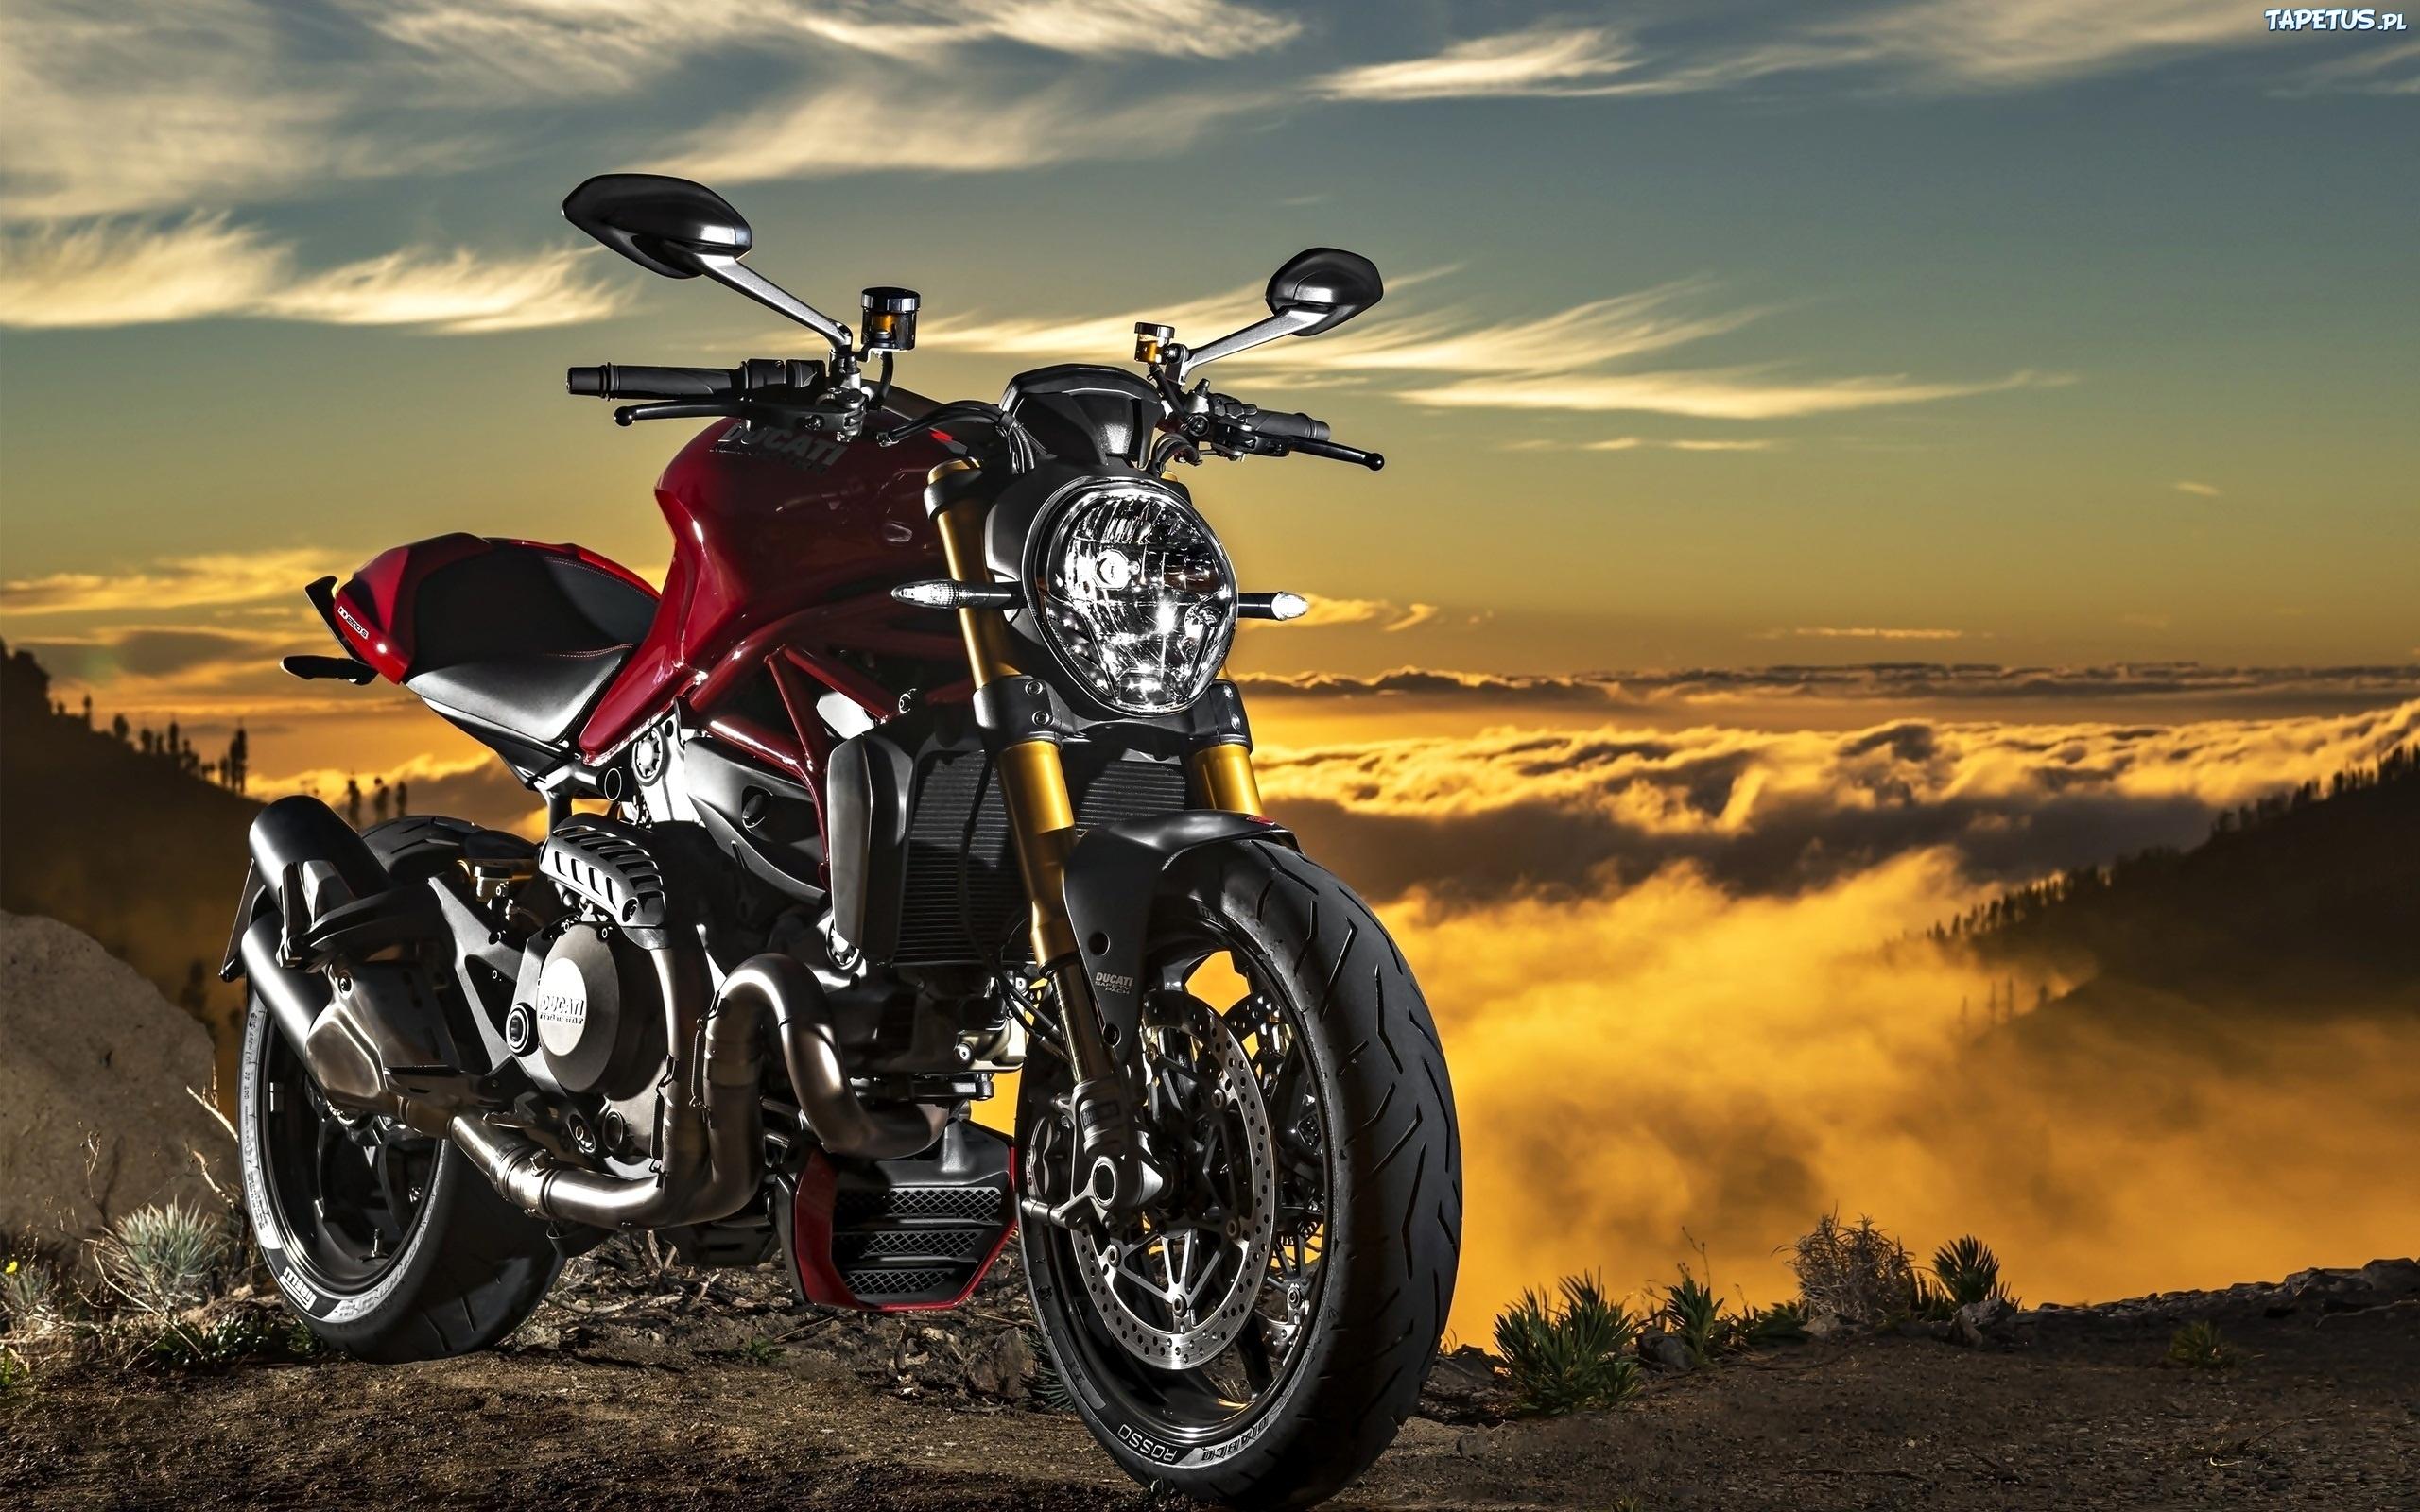 мотоцикл байк без смс